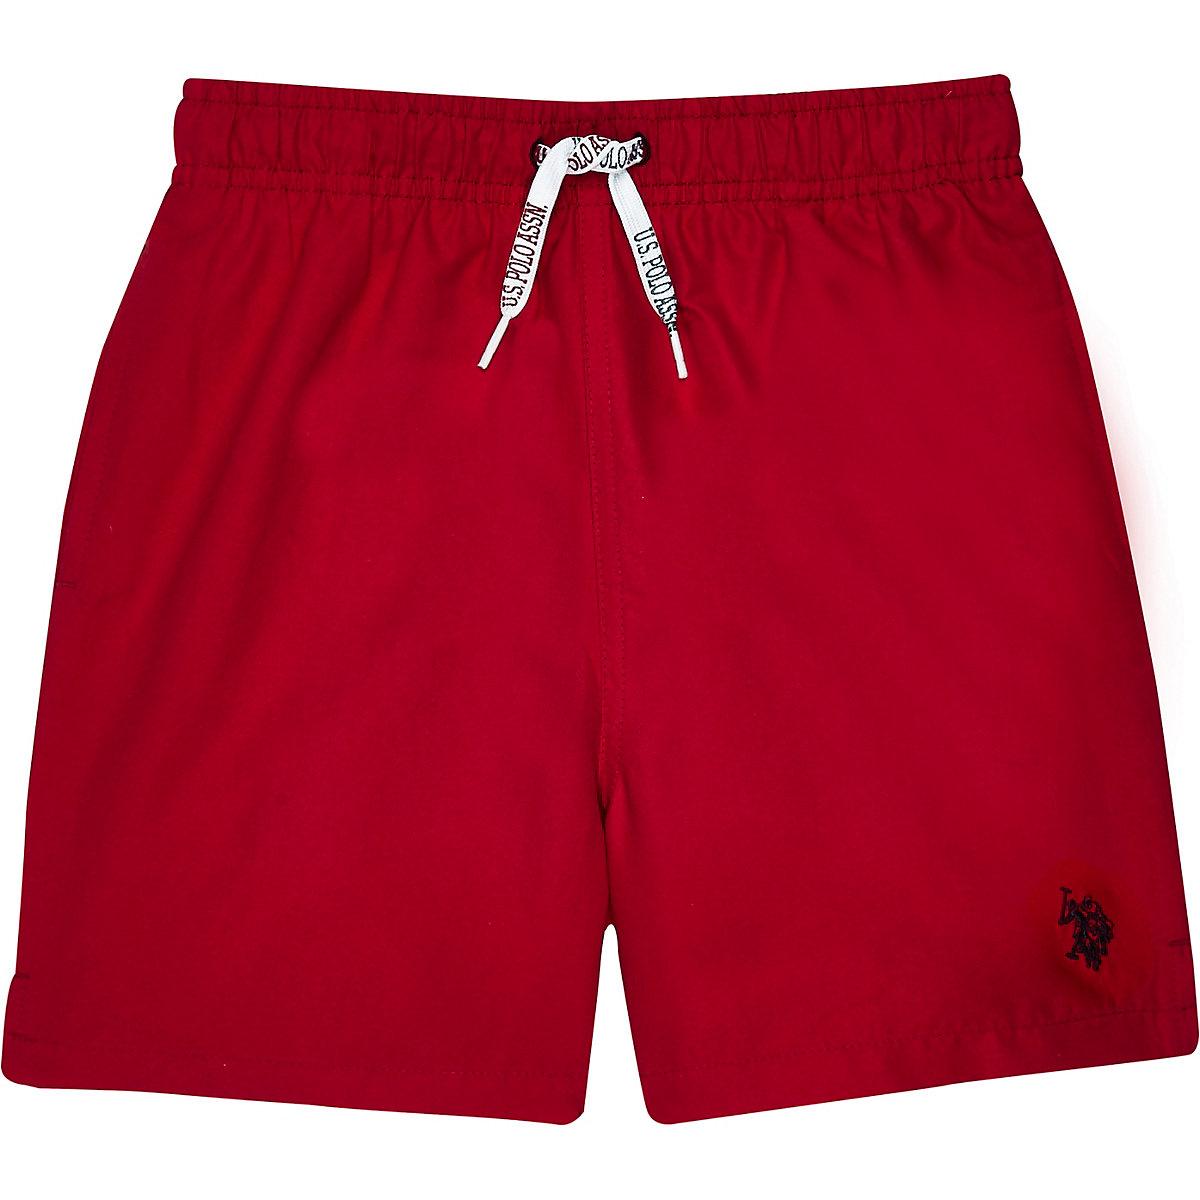 Boys red U.S. Polo Assn. swim shorts